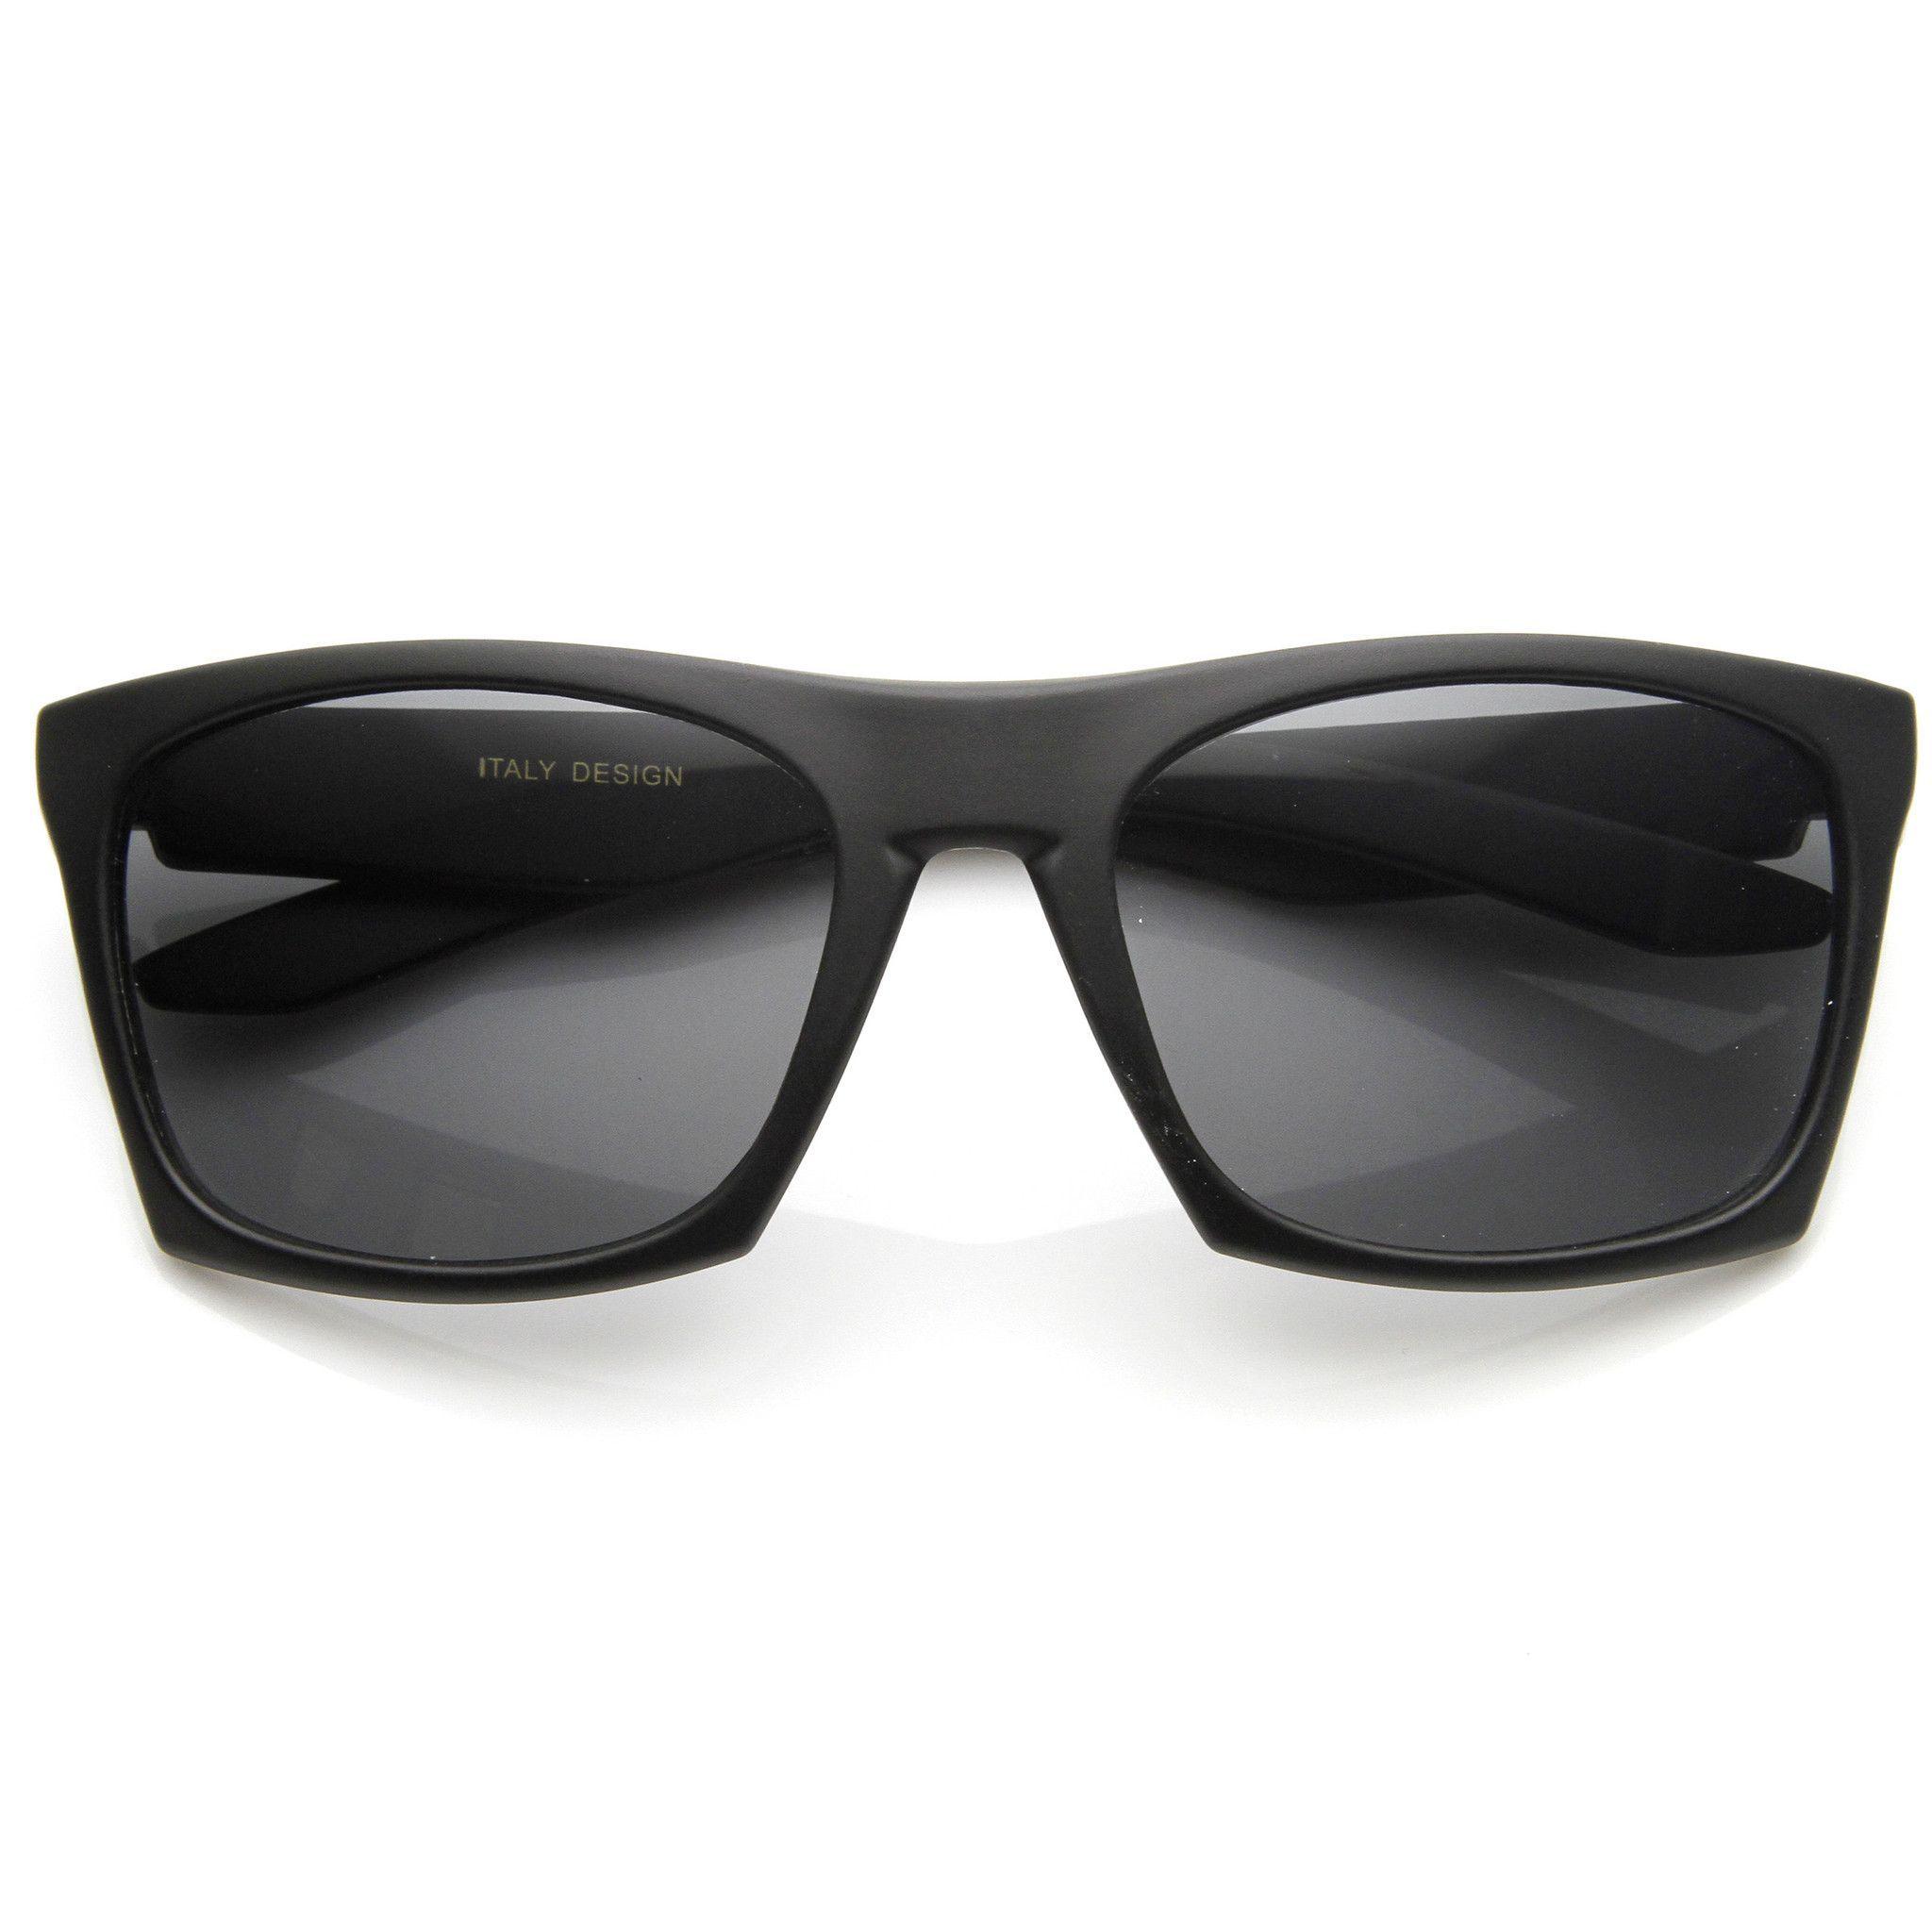 7dd400010 Mens Action Sports Edge Cut Wayfarer Sunglasses 9150 | zeroUV | Sexy ...